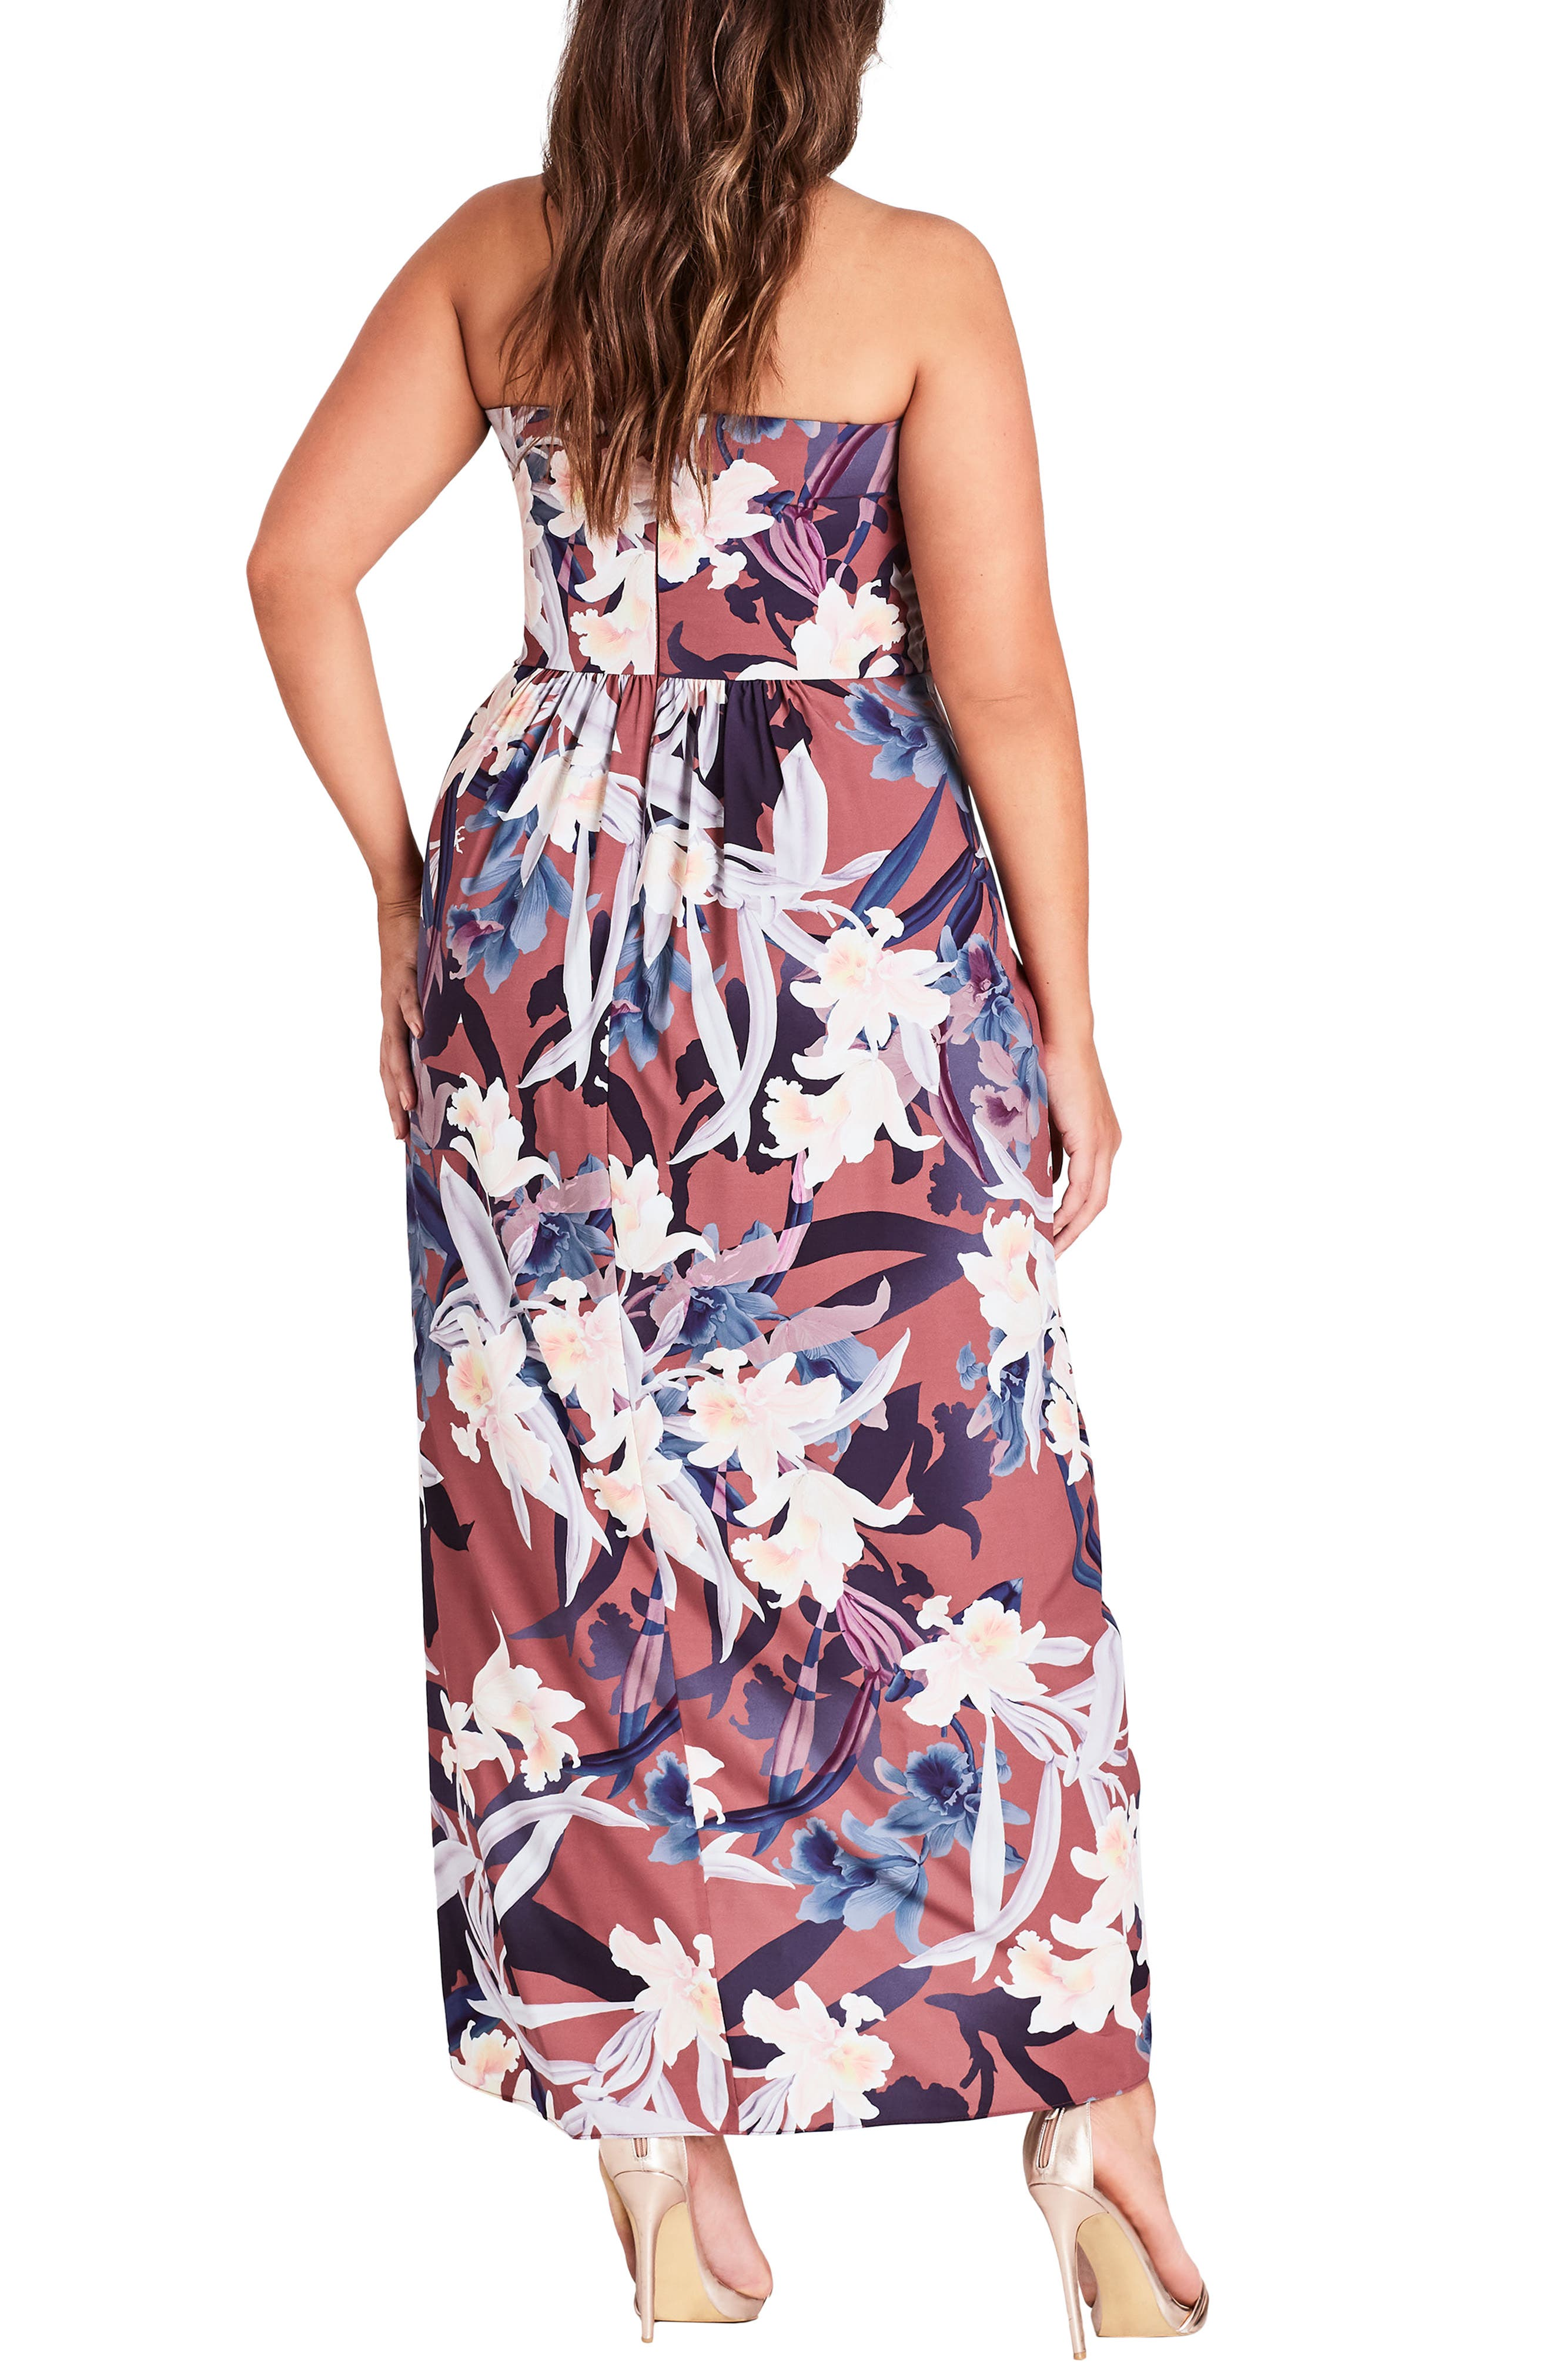 CITY CHIC,                             Lavish Floral Strapless Dress,                             Alternate thumbnail 2, color,                             200